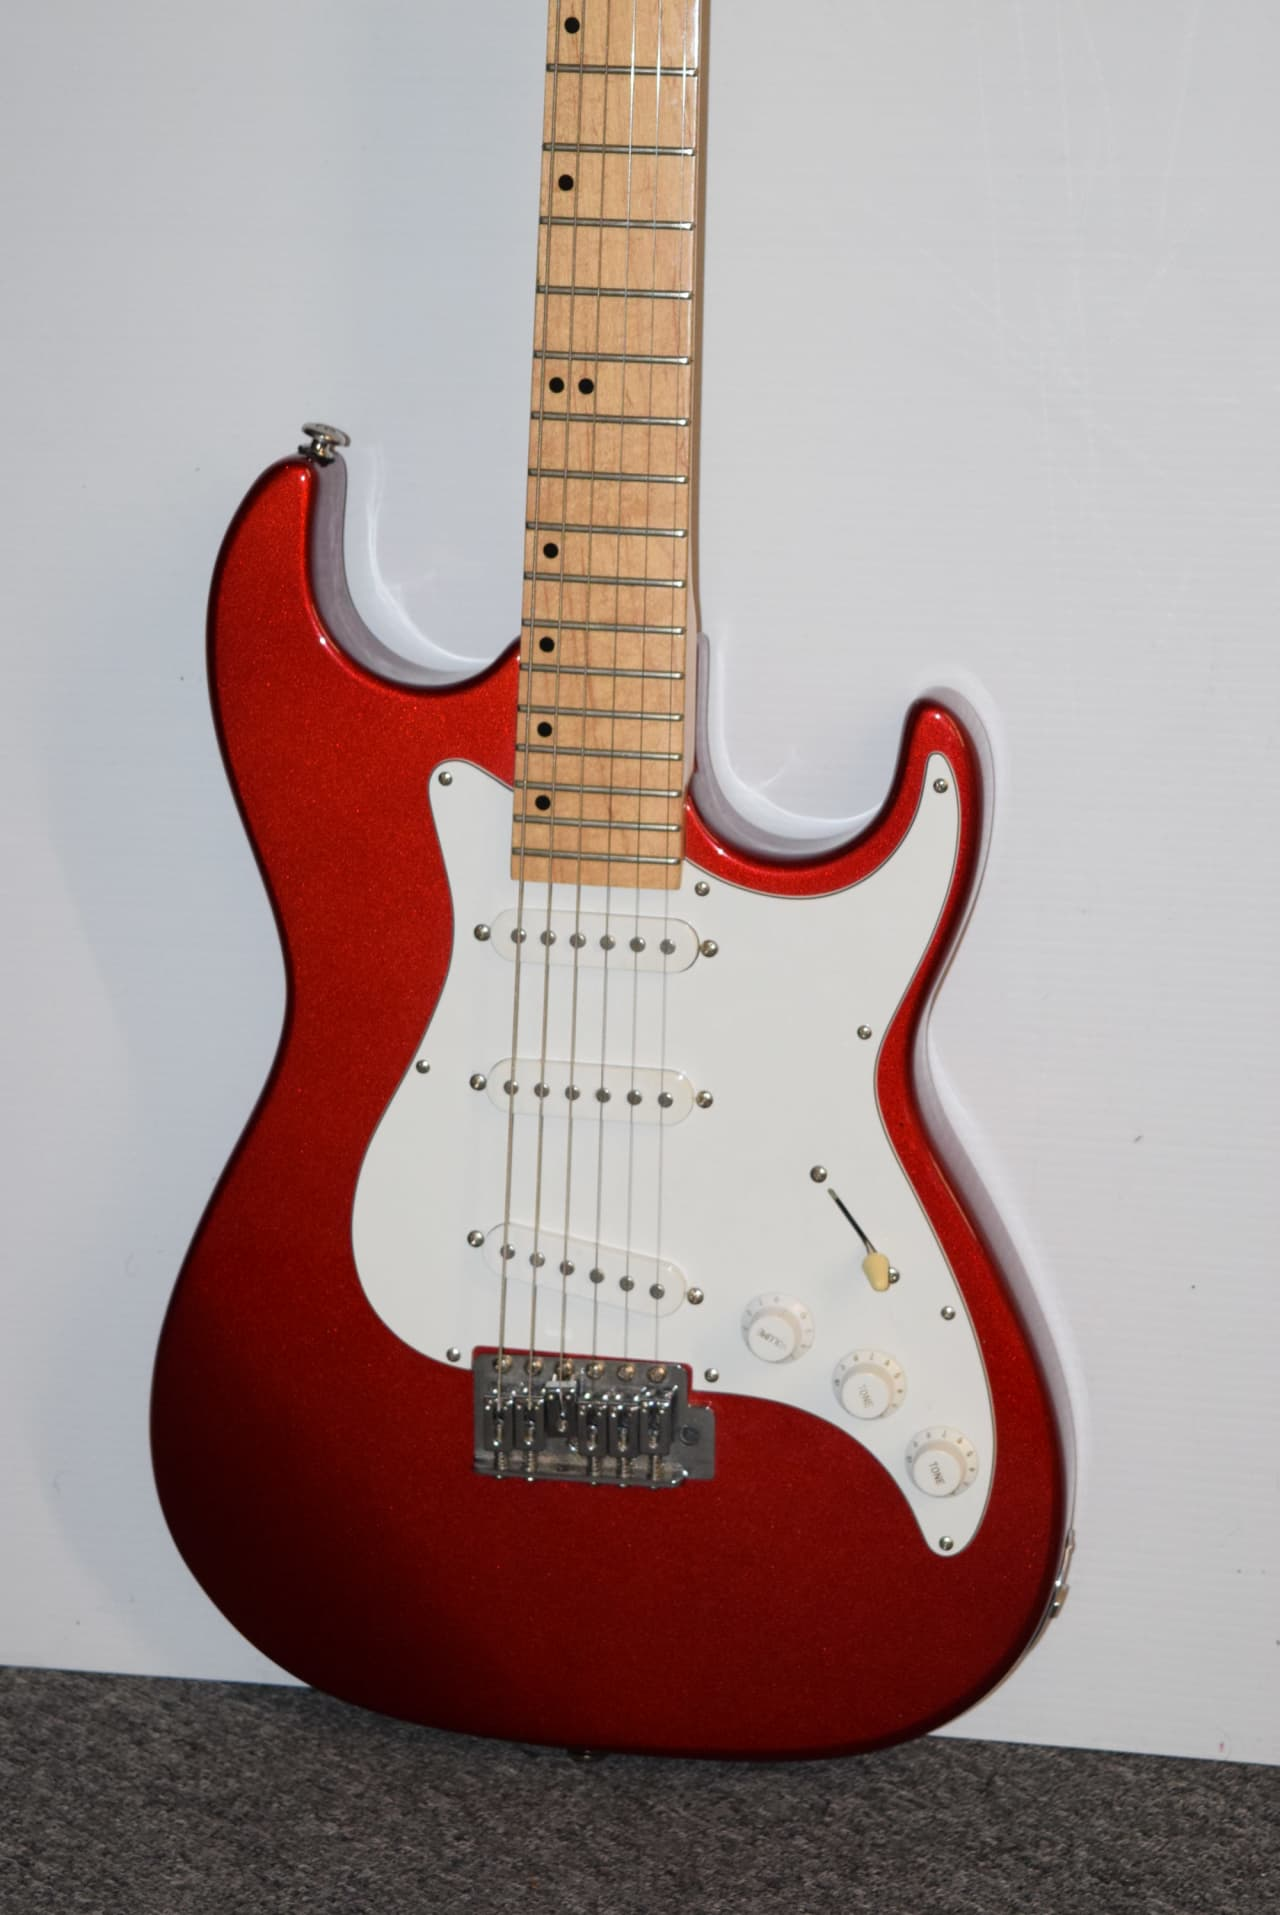 samick strat type electric guitar house of guitars reverb. Black Bedroom Furniture Sets. Home Design Ideas